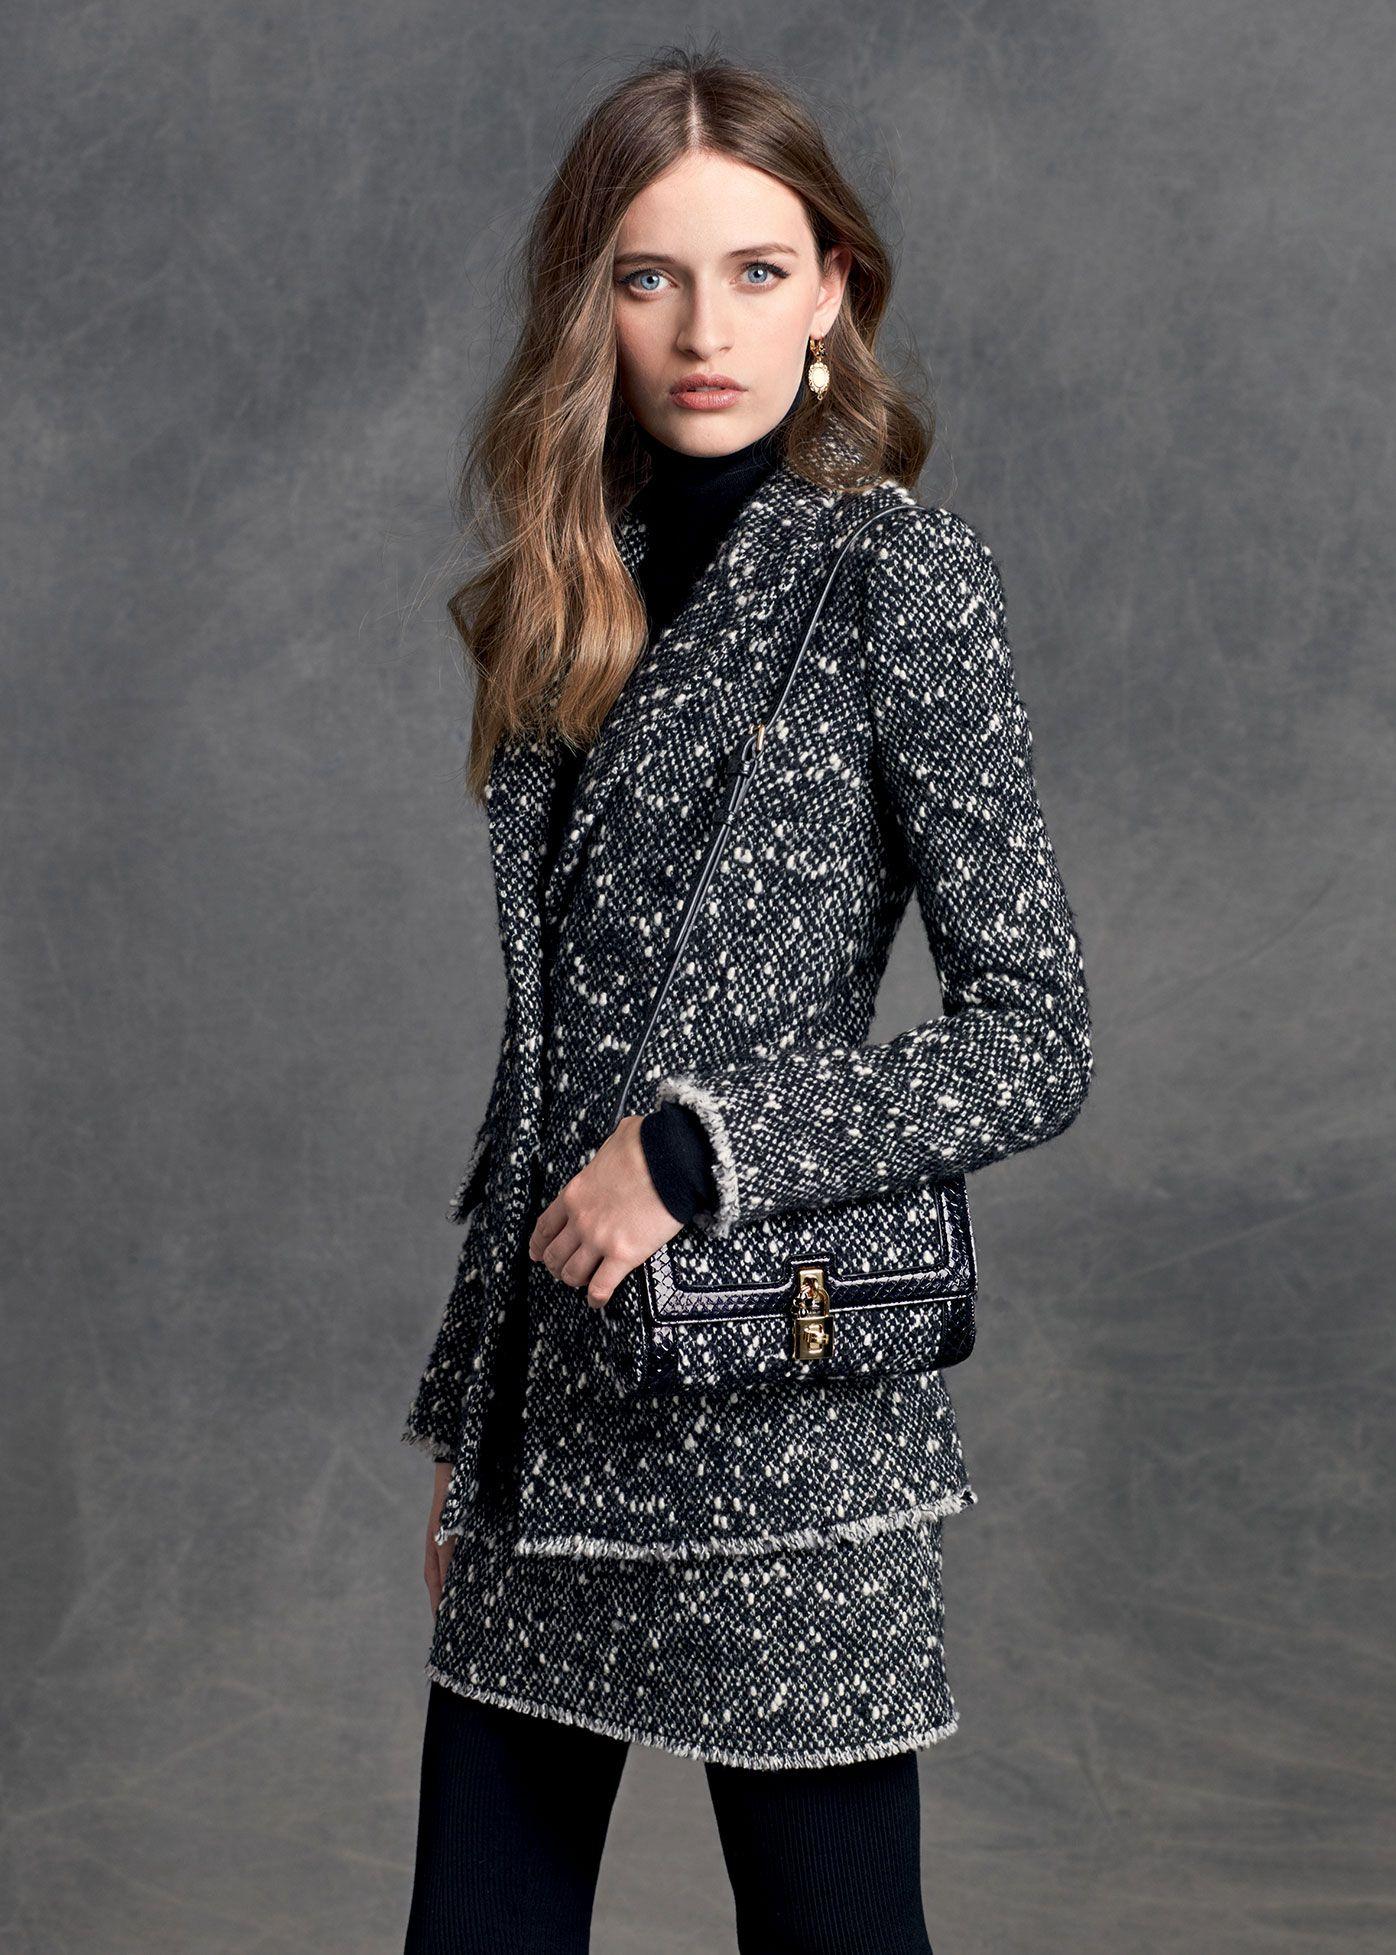 cd874070b3c5 Dolce   Gabbana Women s Clothing Collection Winter 2016